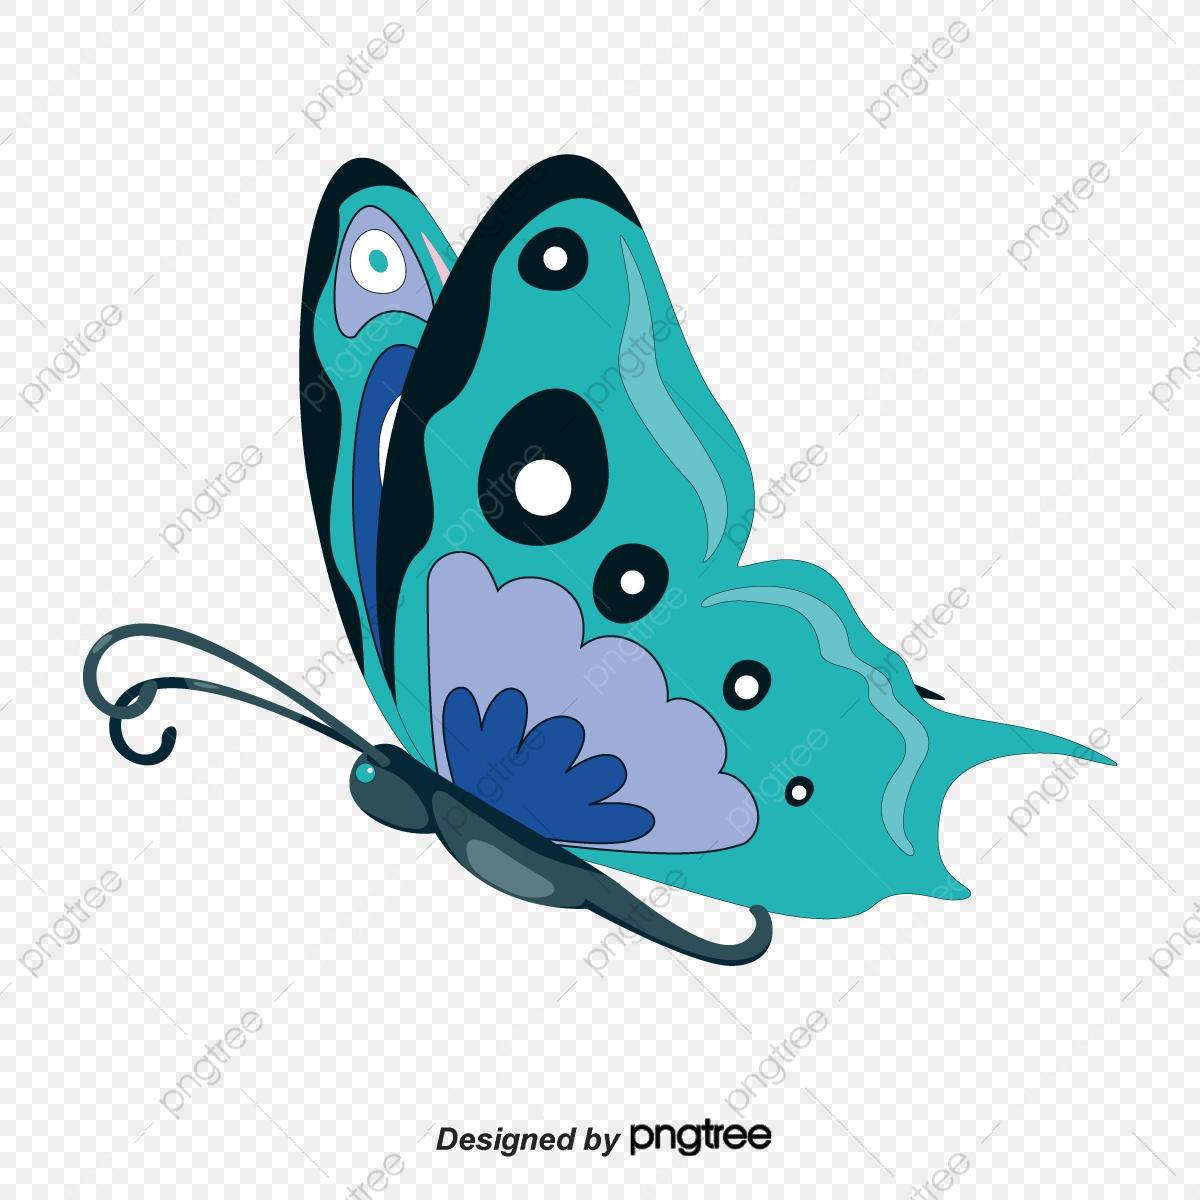 Fliegender Schmetterling Clipart, Schmetterling Vector über Schmetterlinge Clipart